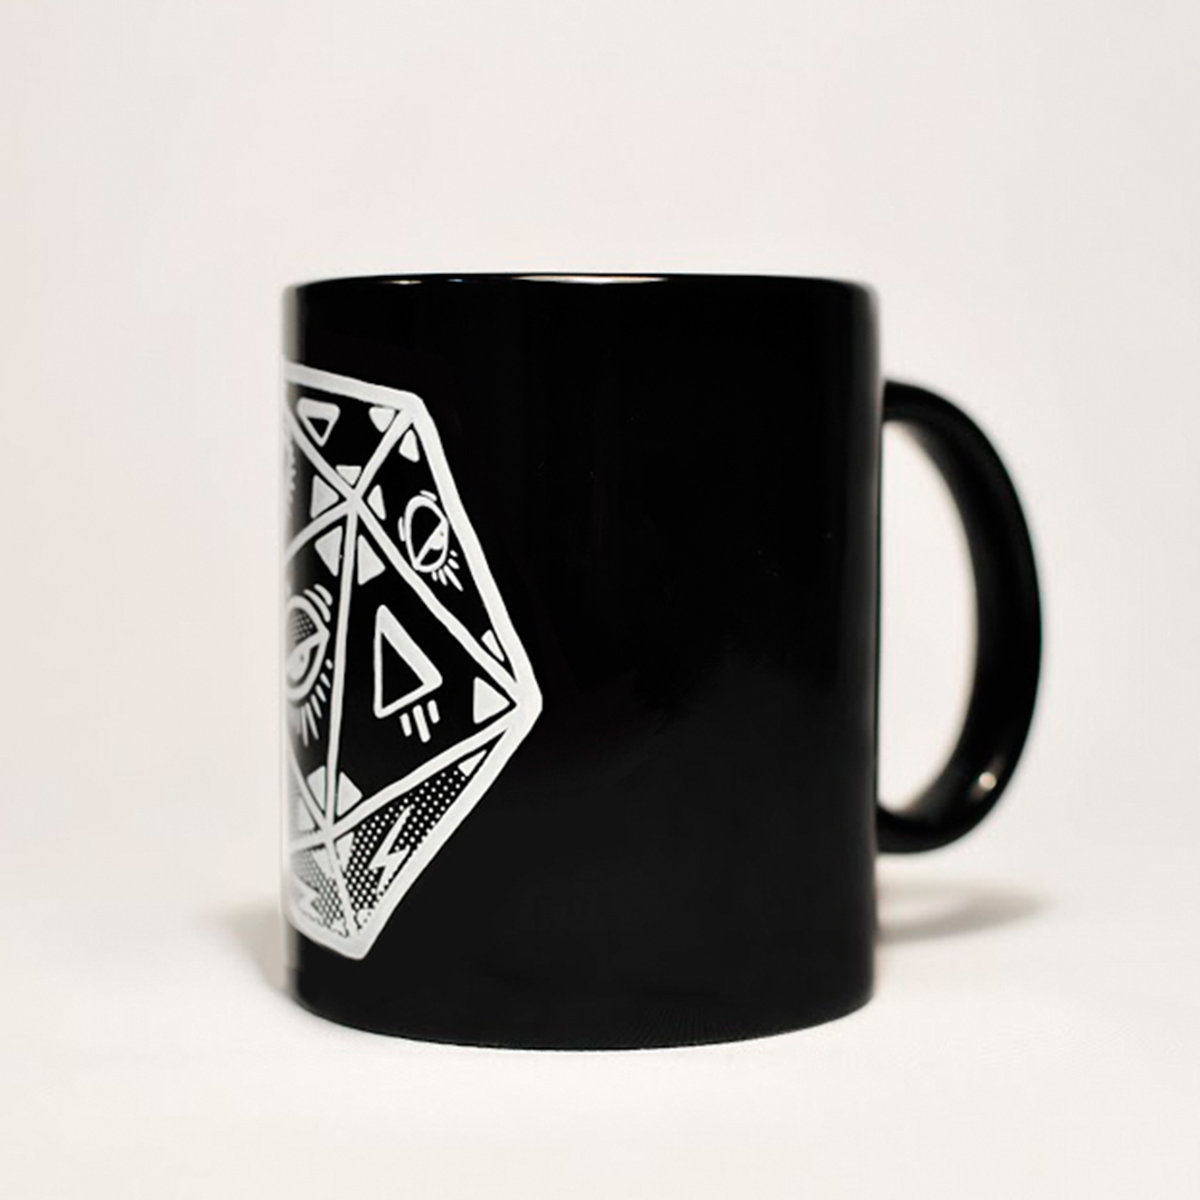 MUG / Black with white ink / Icosahedron | Animal de Galaxia